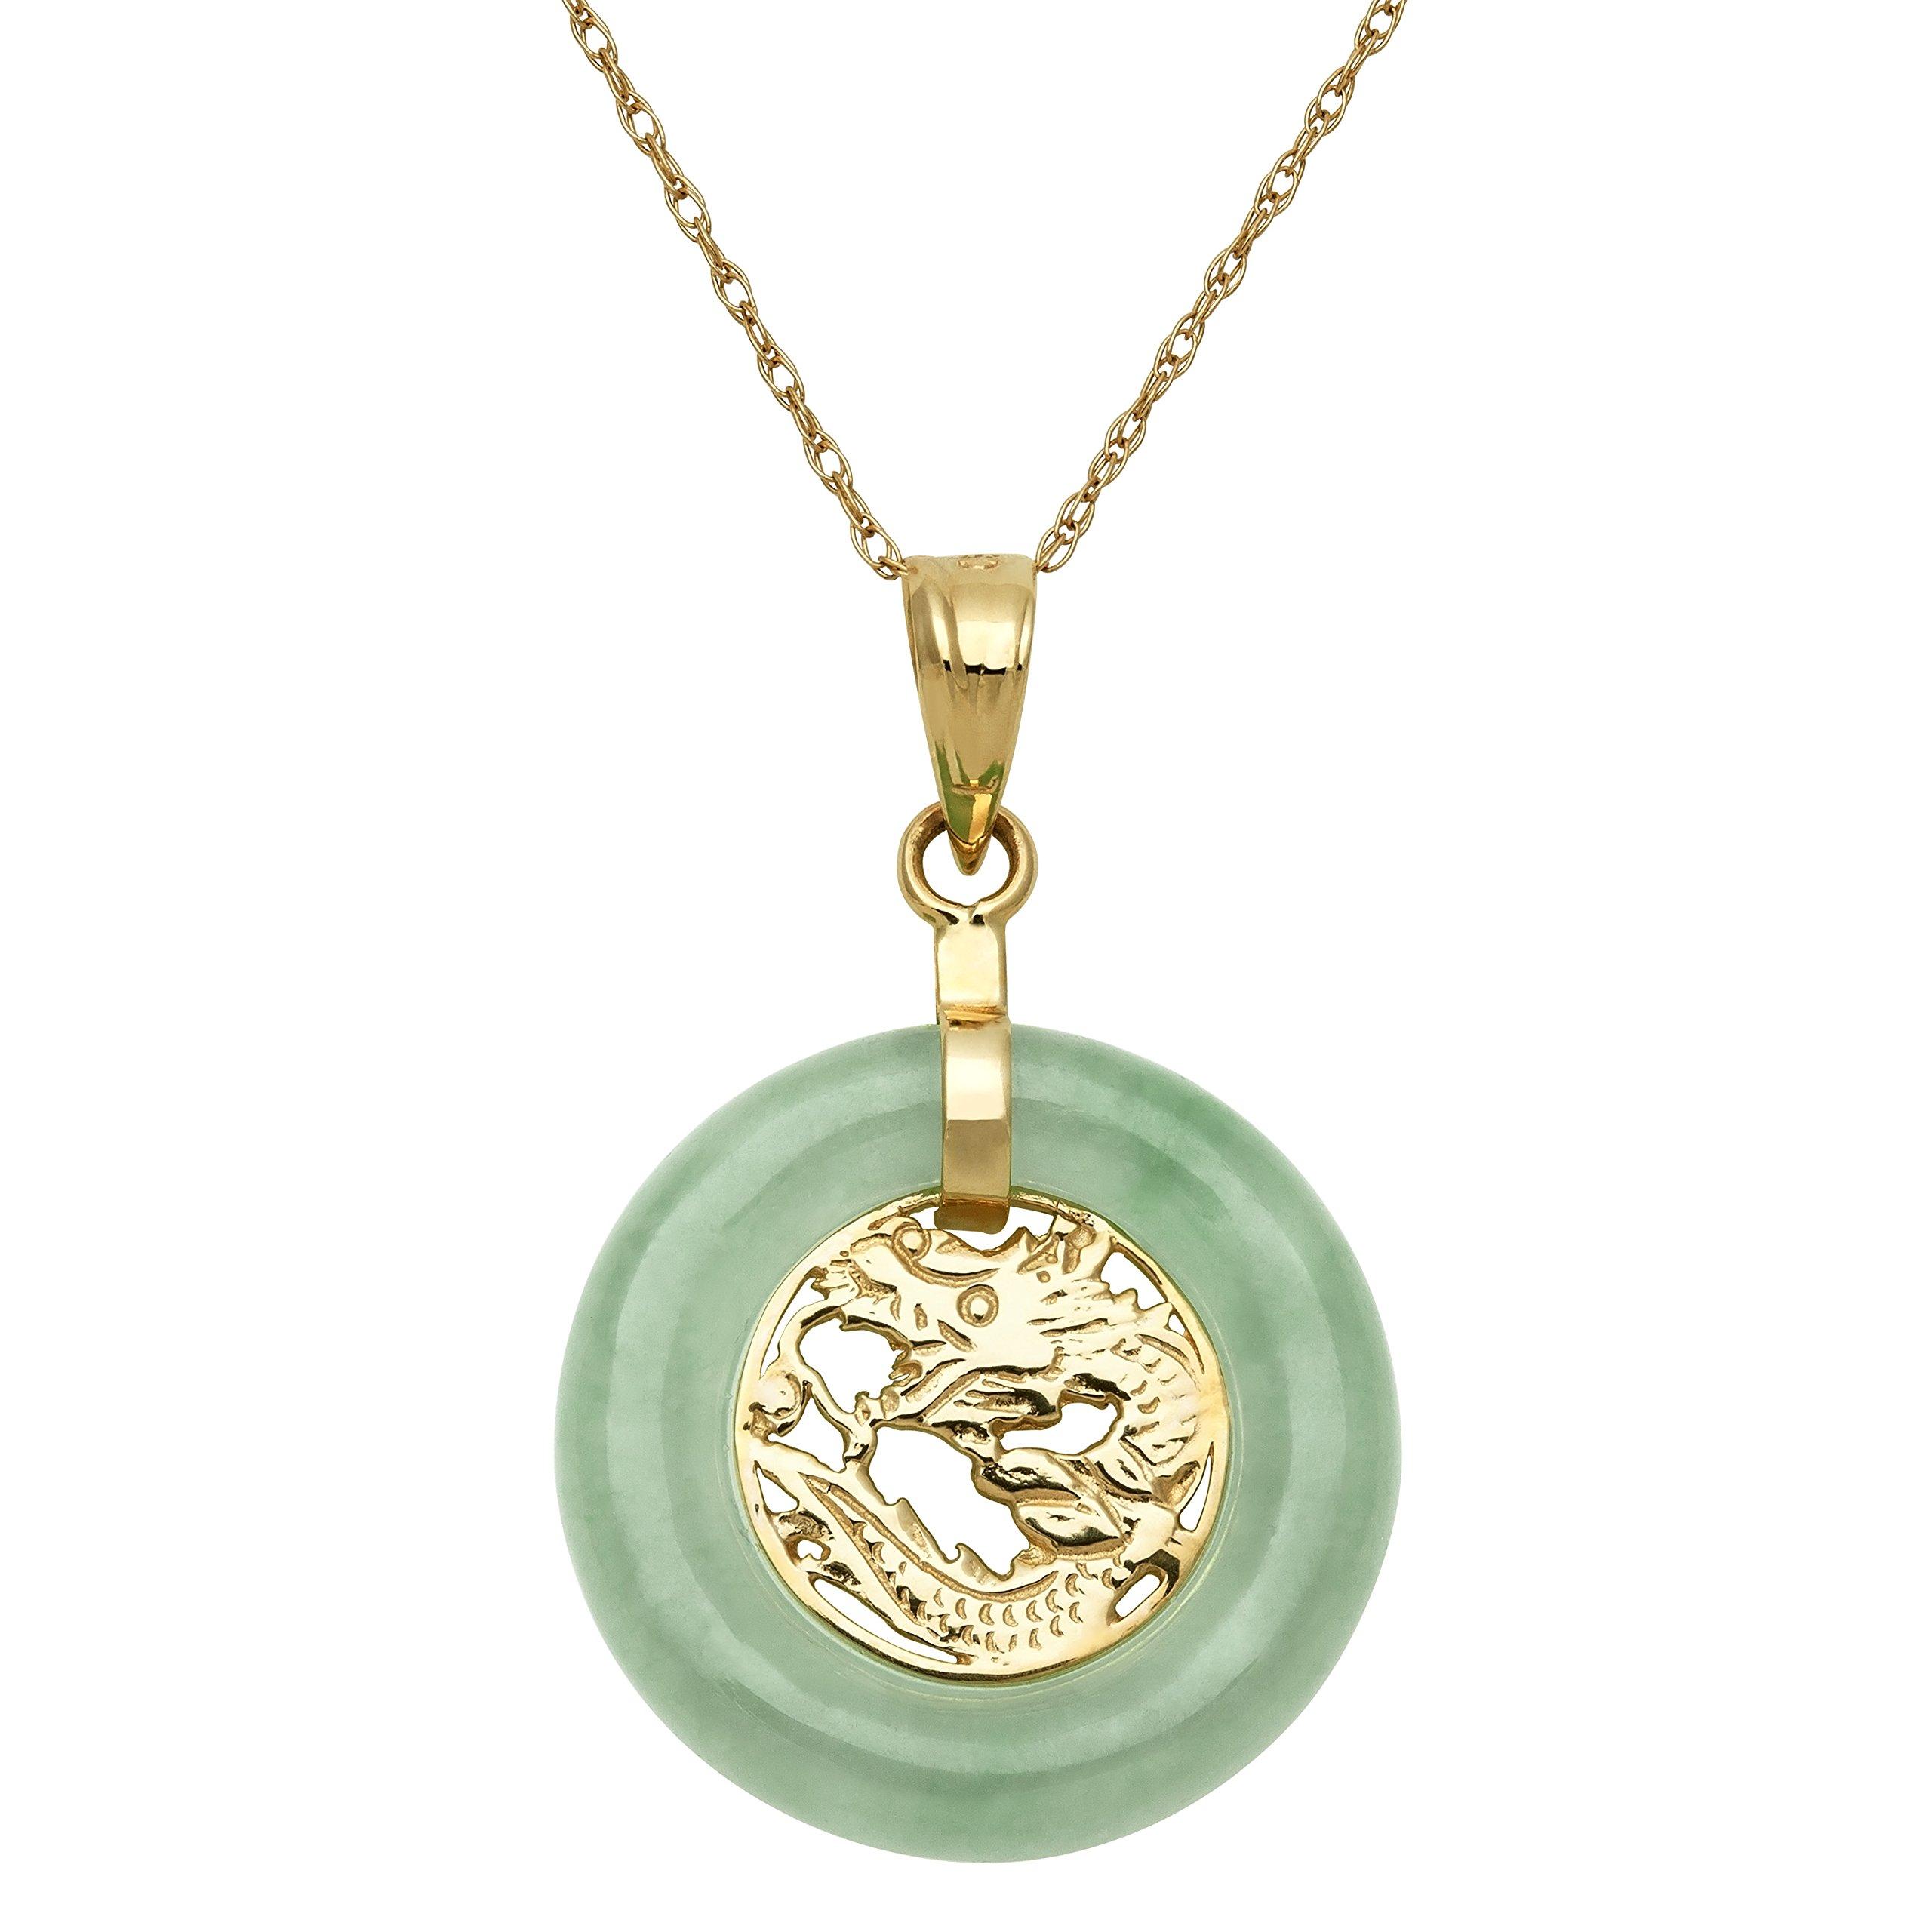 10k Yellow Gold Natural Green Jade Dragon Pendant Necklace,18''